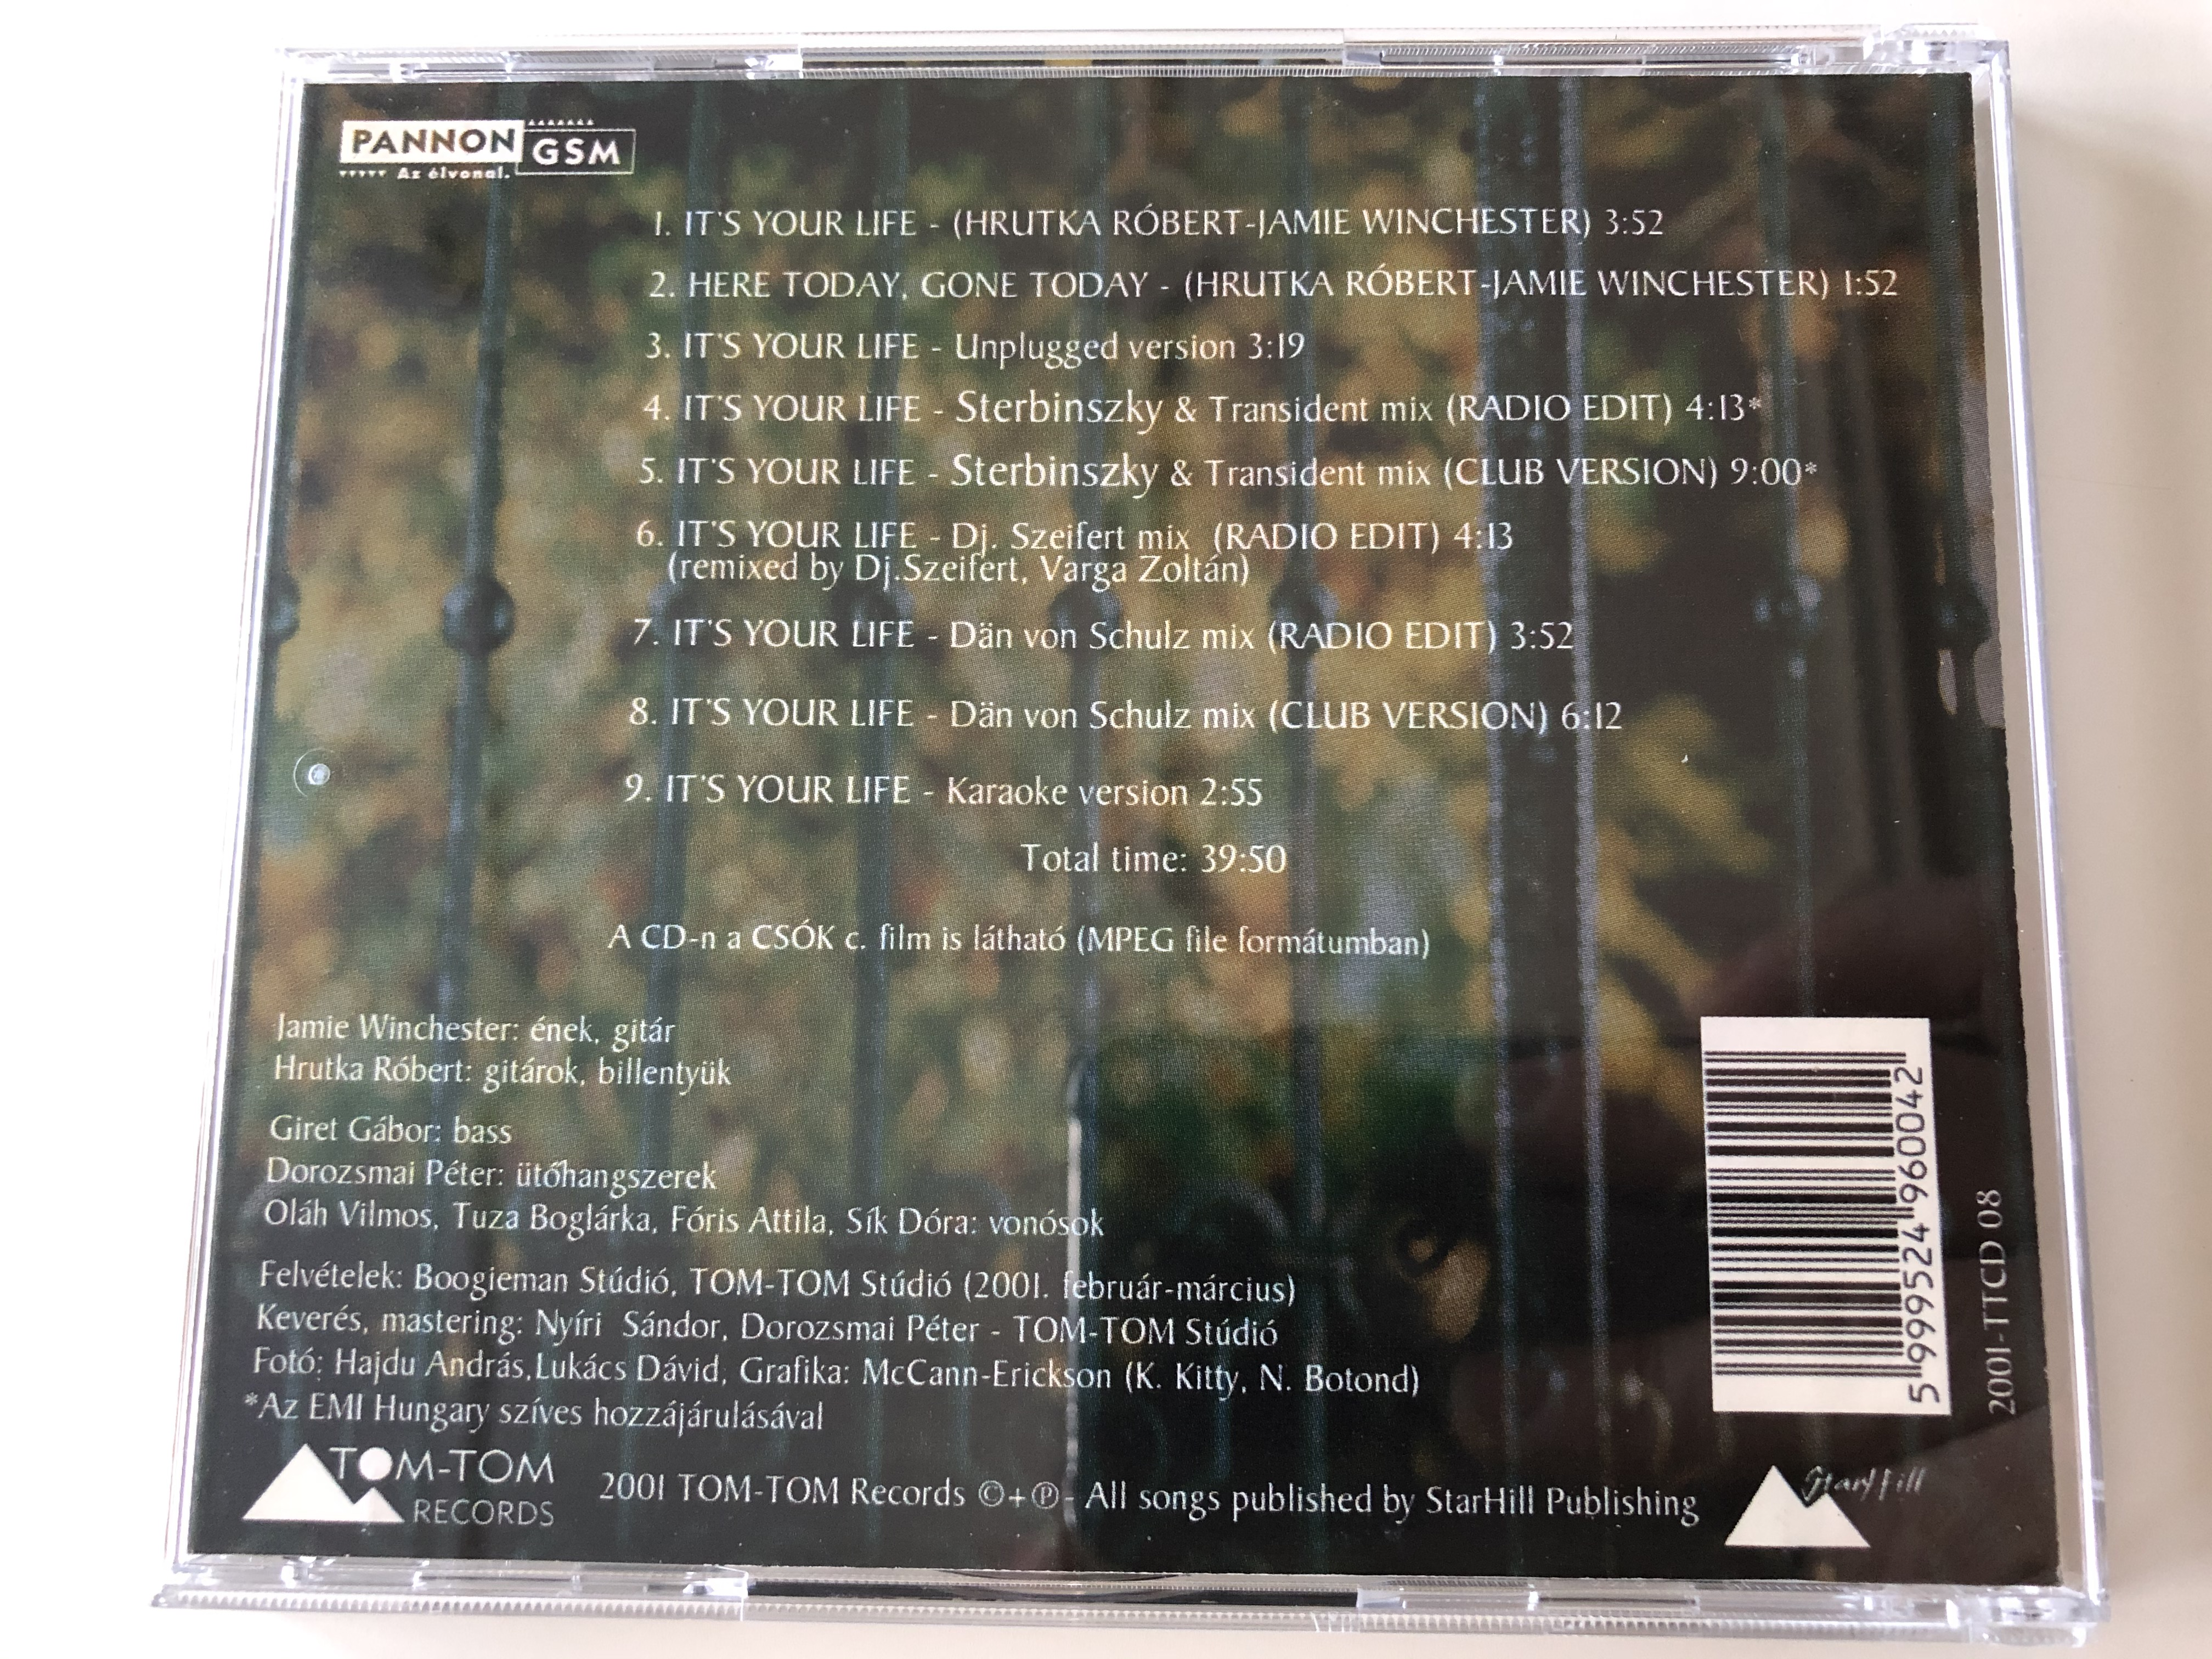 a-pannon-gsm-bemutatia-jamie-winchester-hrutka-r-bert-it-s-your-life-tom-tom-records-audio-cd-2001-2001-ttcd-08-5-.jpg